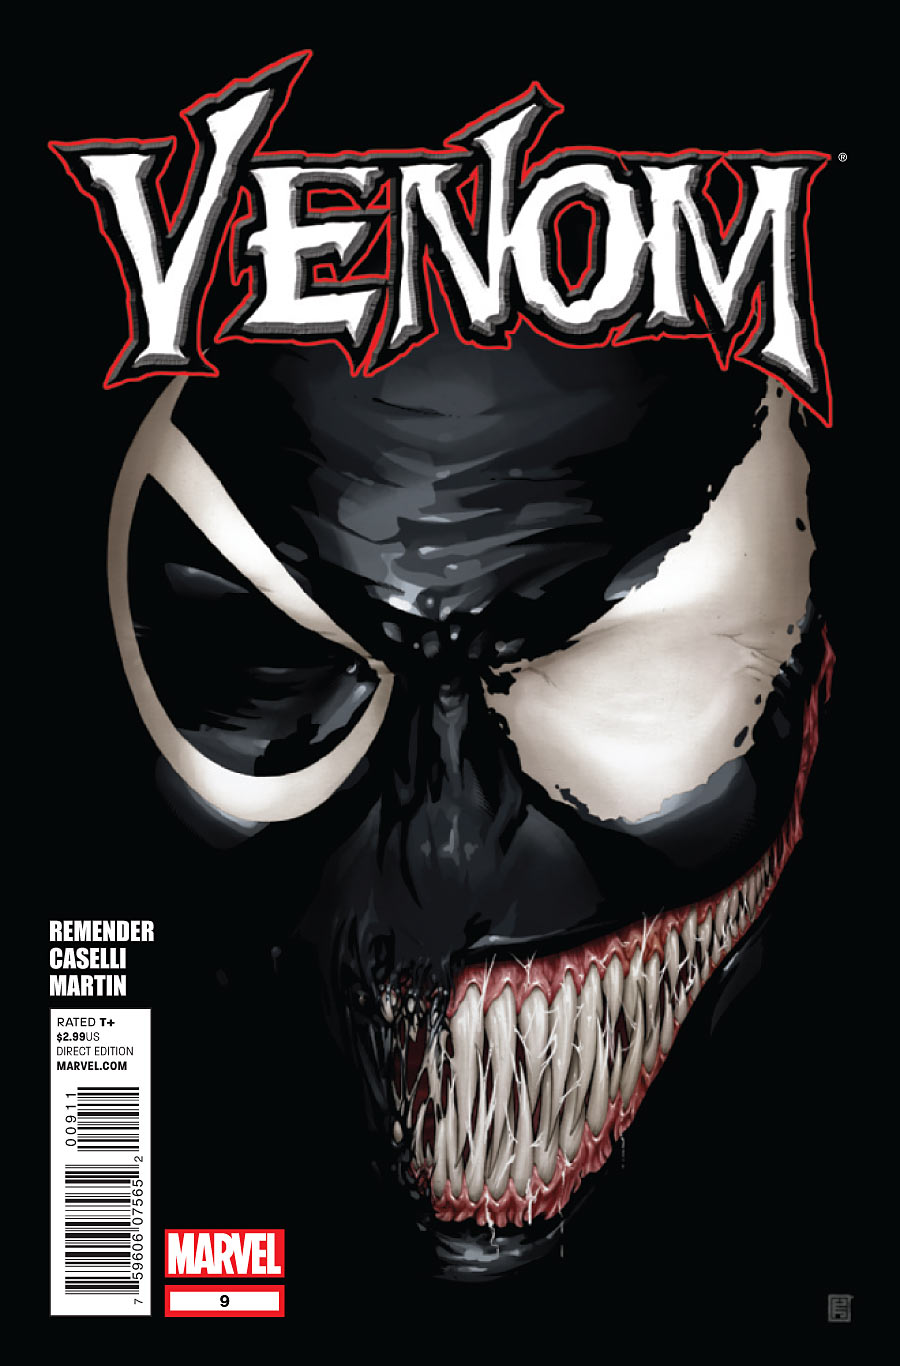 http://4.bp.blogspot.com/-kHKtATDWyt4/UTEZ23IpKNI/AAAAAAAAdHc/zzPMryf46GY/s1600/Venom_Vol_2_9.jpg